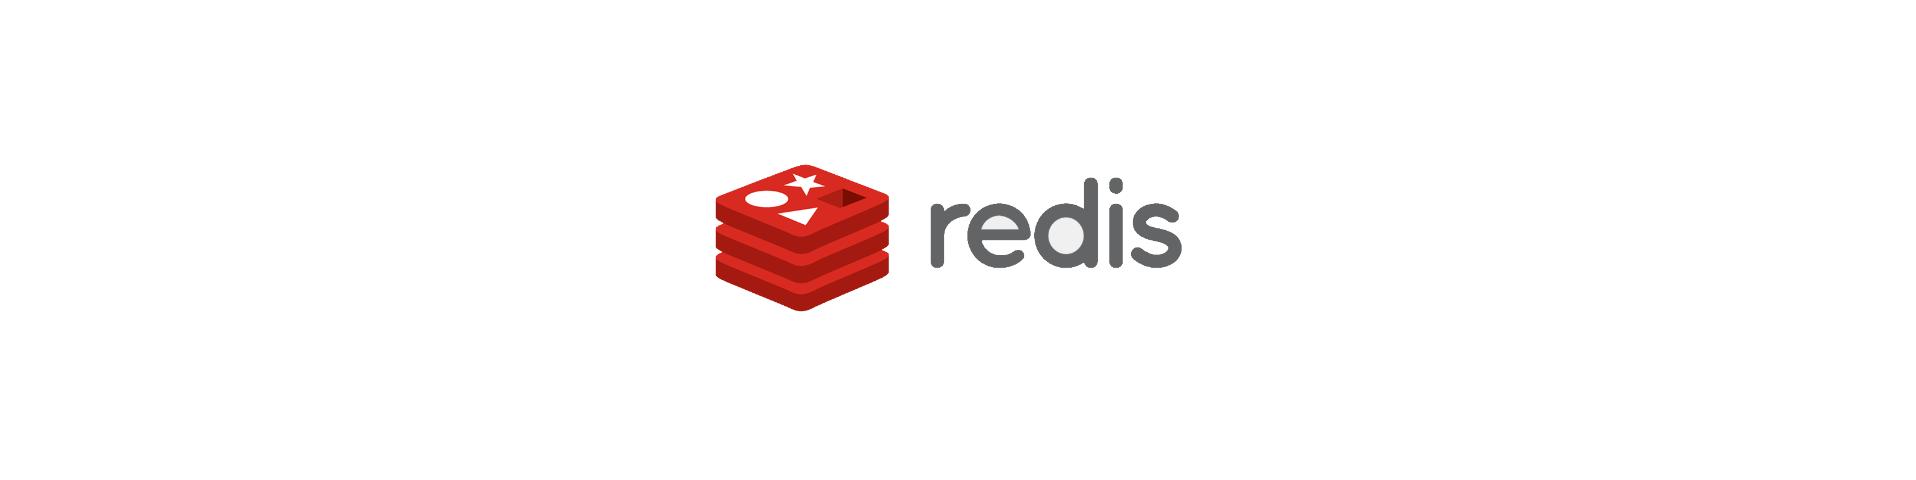 docker-compose部署Redis-Cluster集群